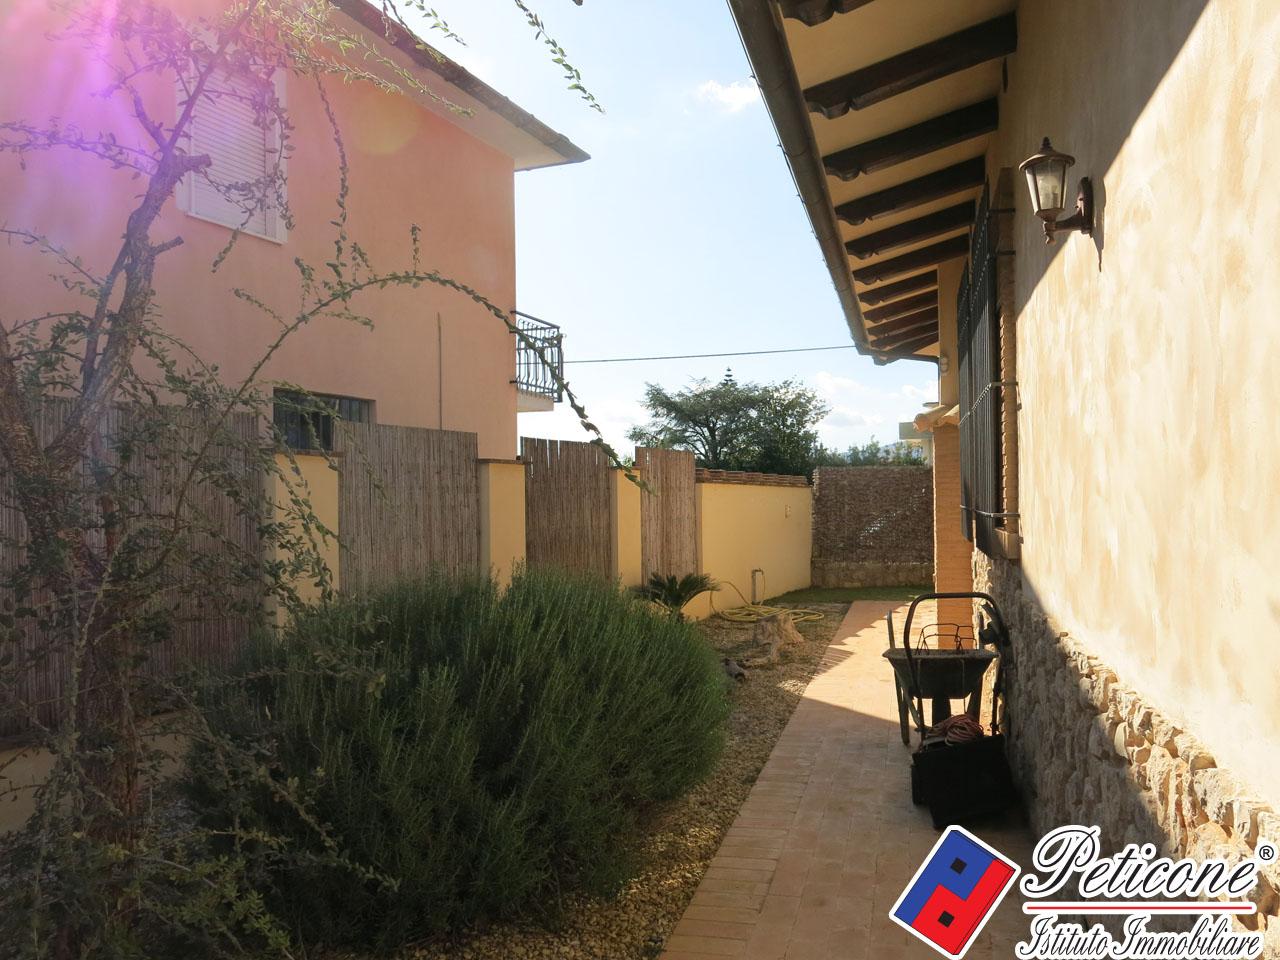 Villa in Vendita a Fondi: 3 locali, 107 mq - Foto 27